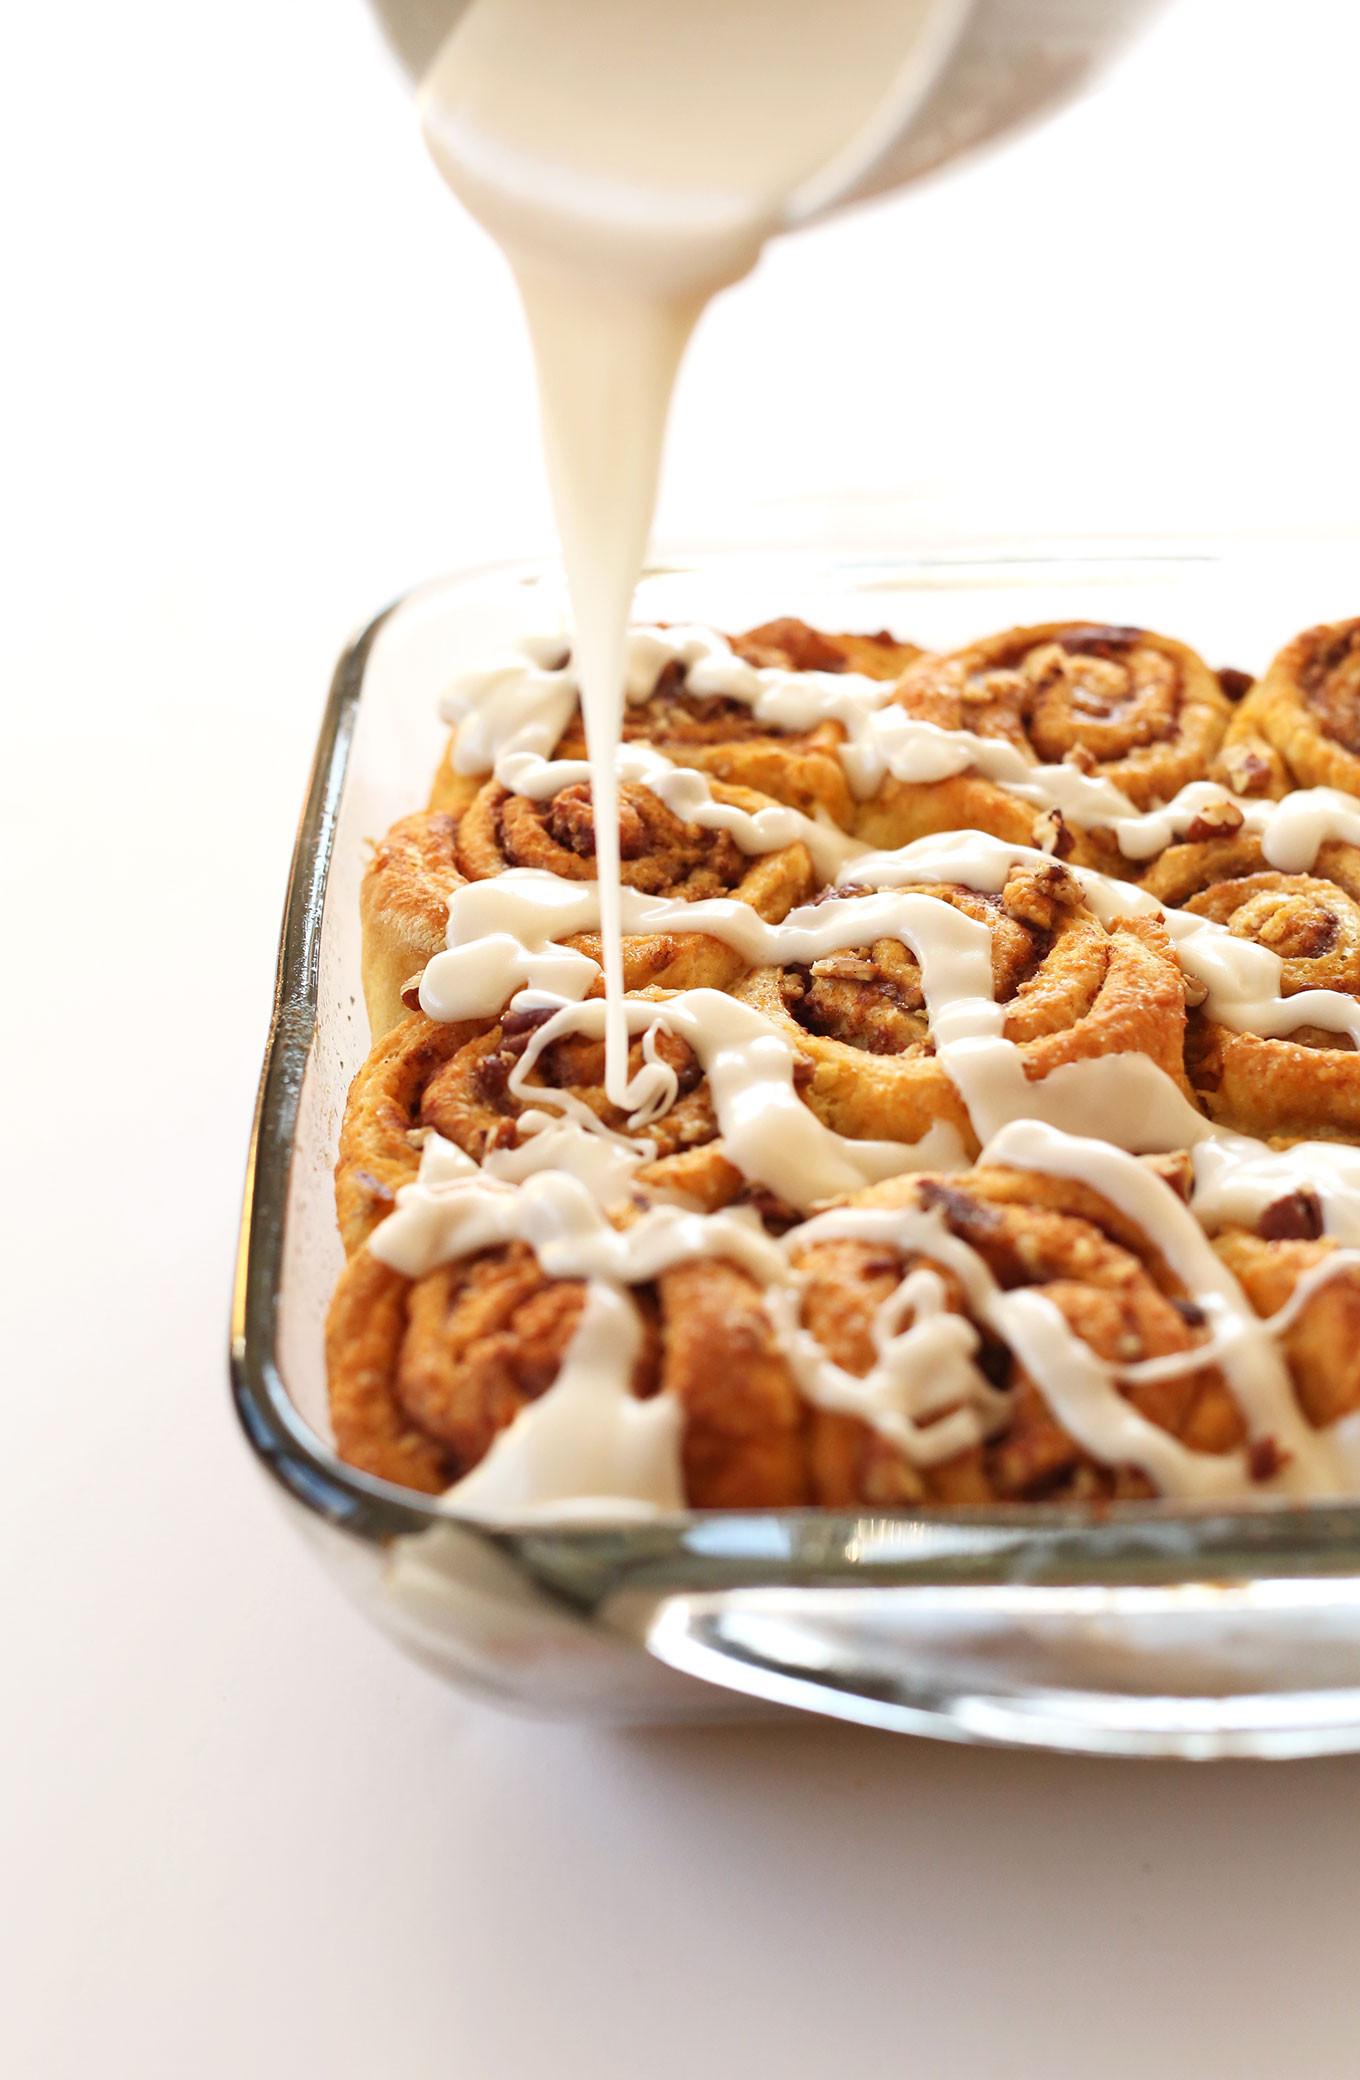 Vegan Pumpkin Desserts Recipes  Vegan Pumpkin Cinnamon Rolls